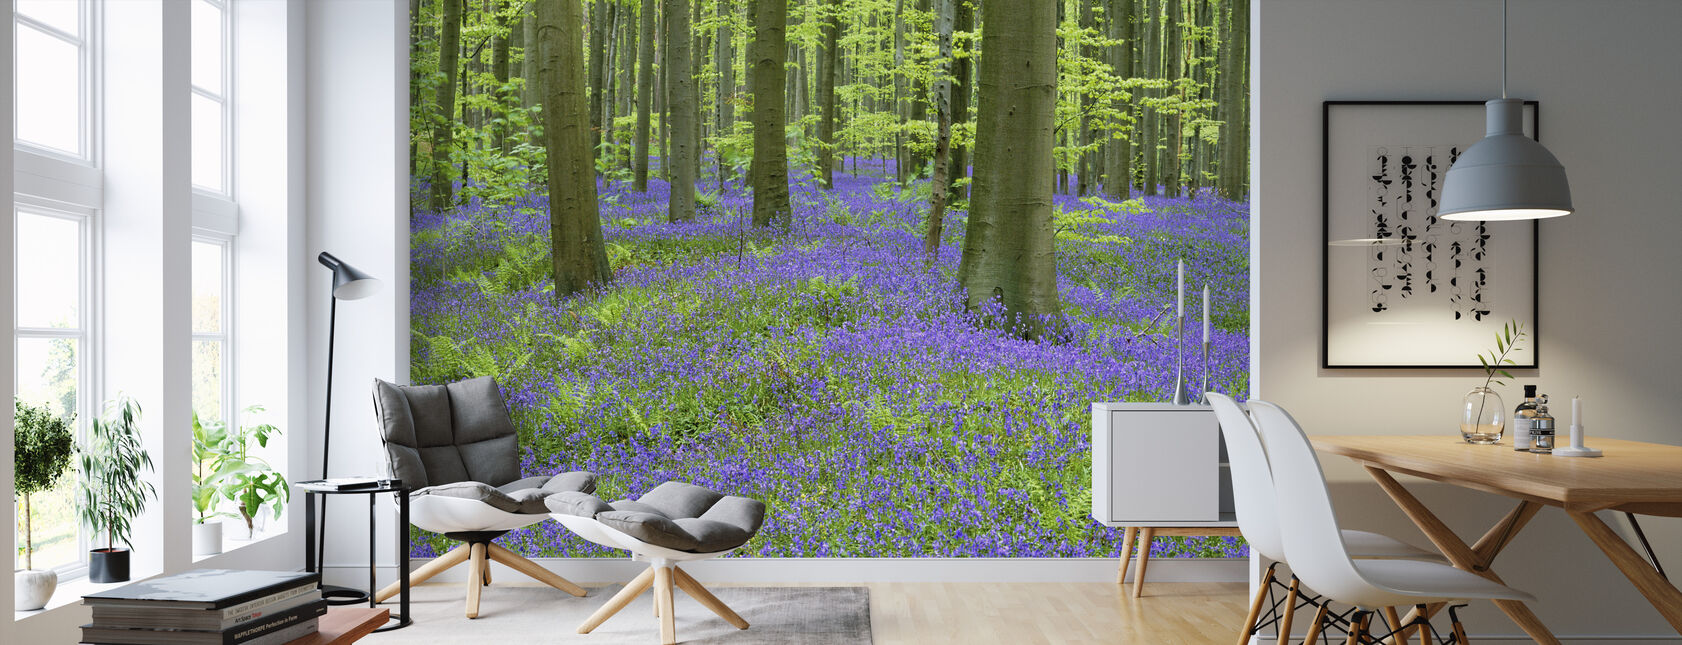 Bluebells Wallpaper - Wallpaper - Living Room